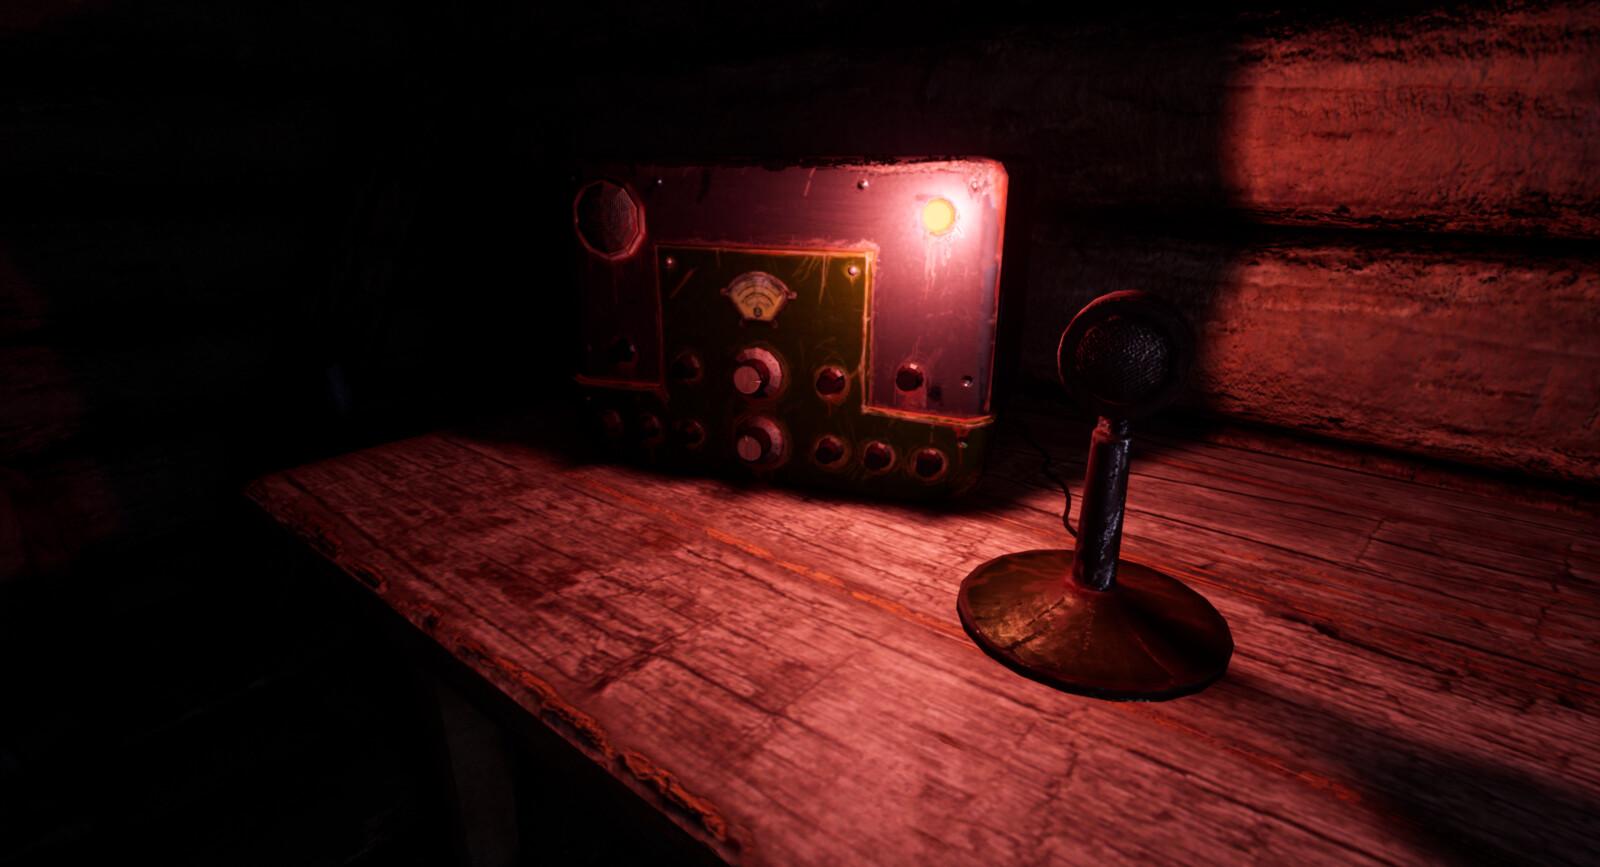 Arachnophobia old radio prop